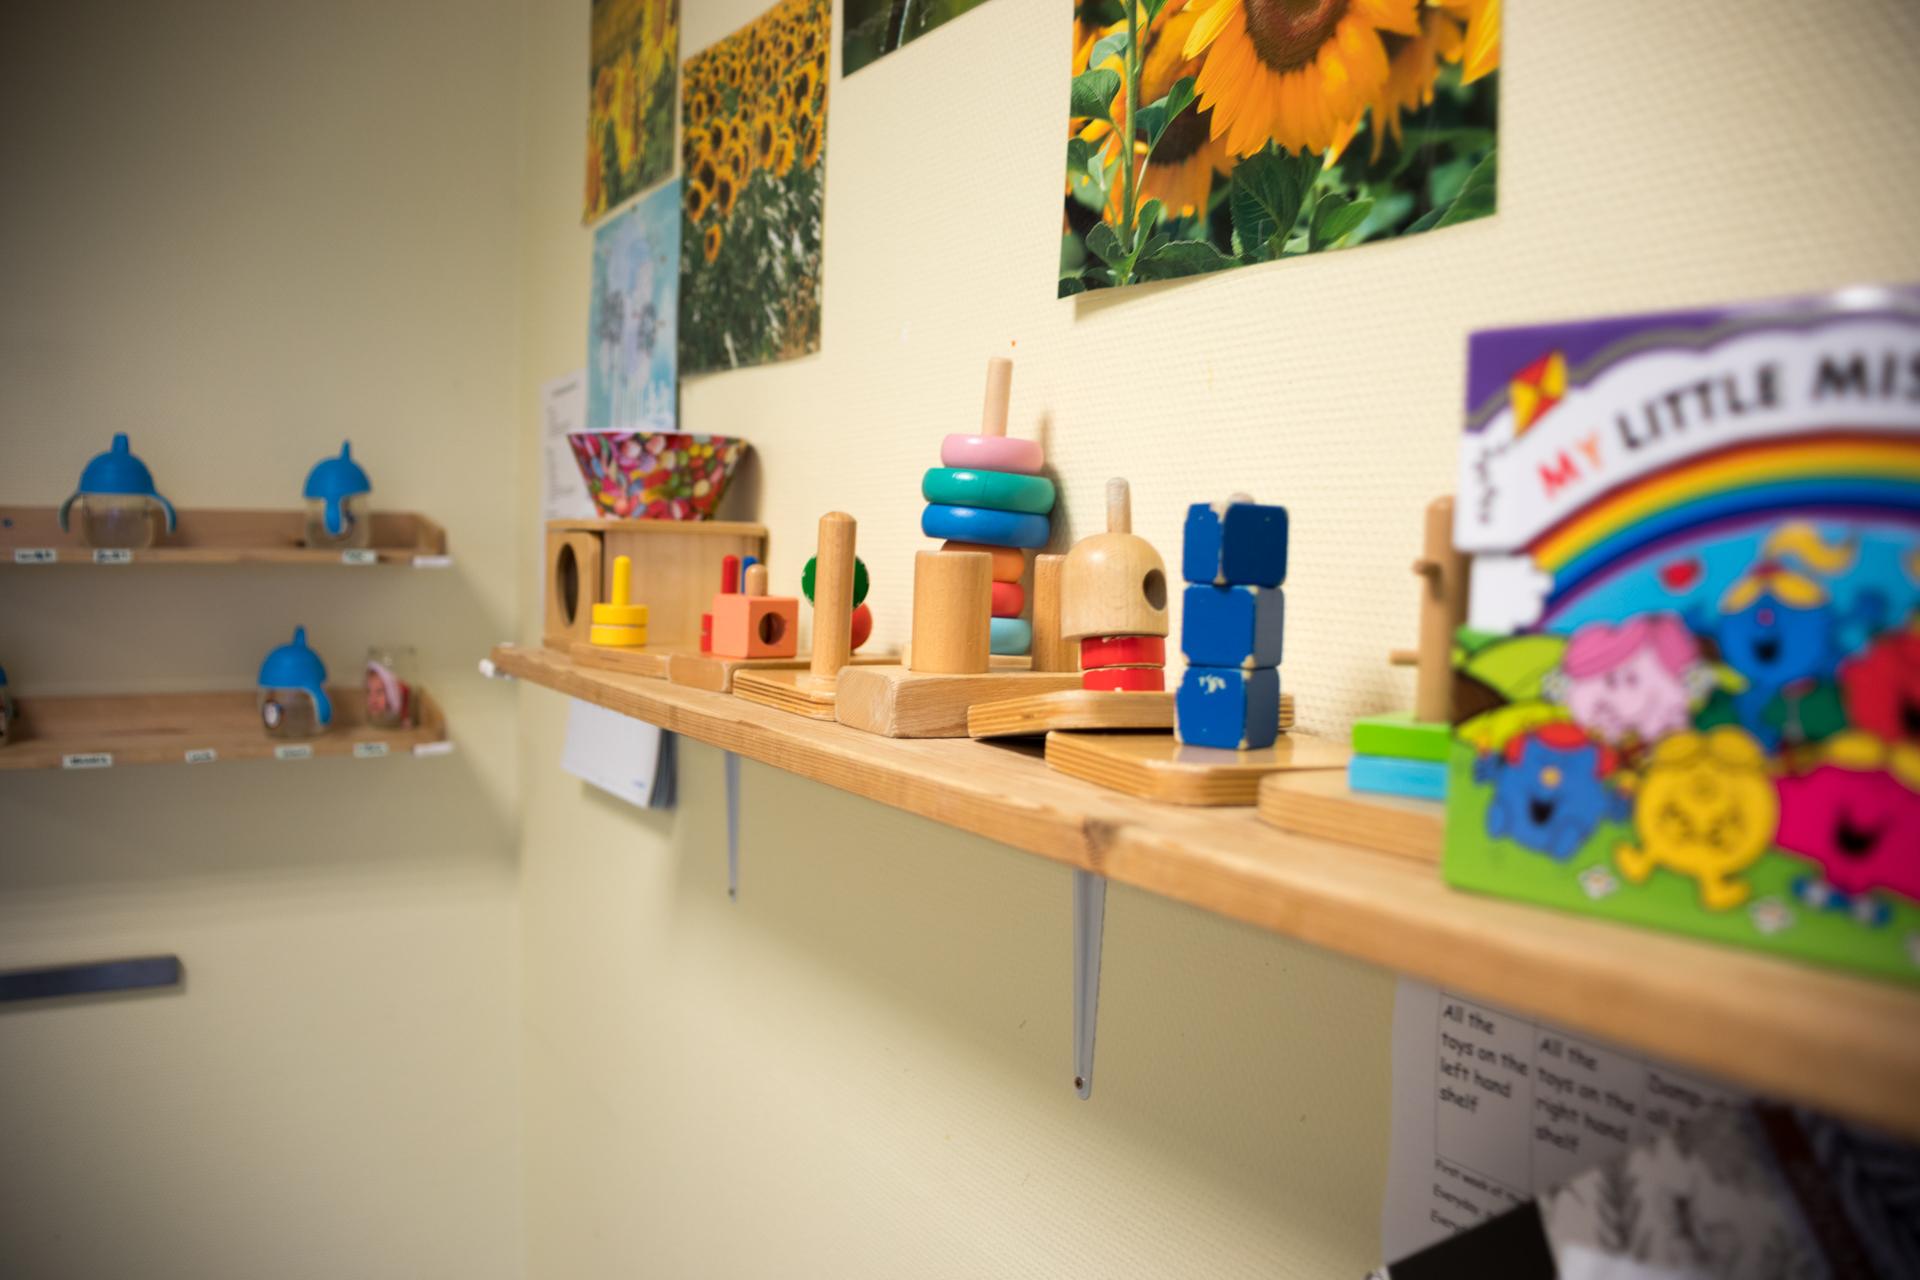 montessori work activity toys shelf sunflower